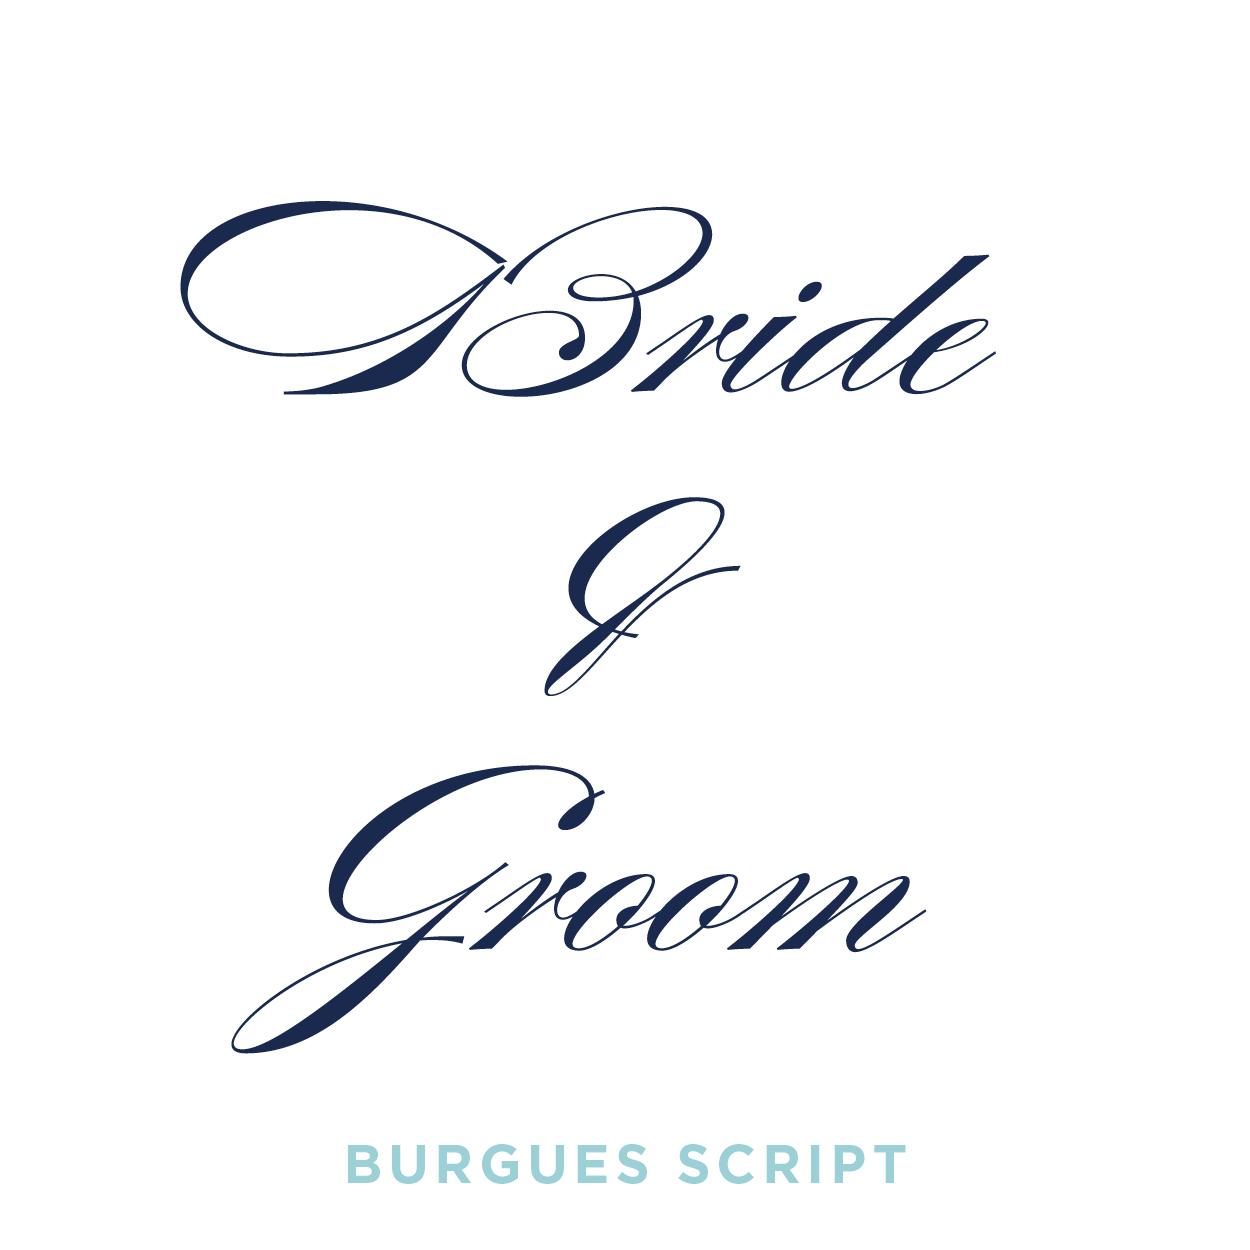 Burgues Script.jpg